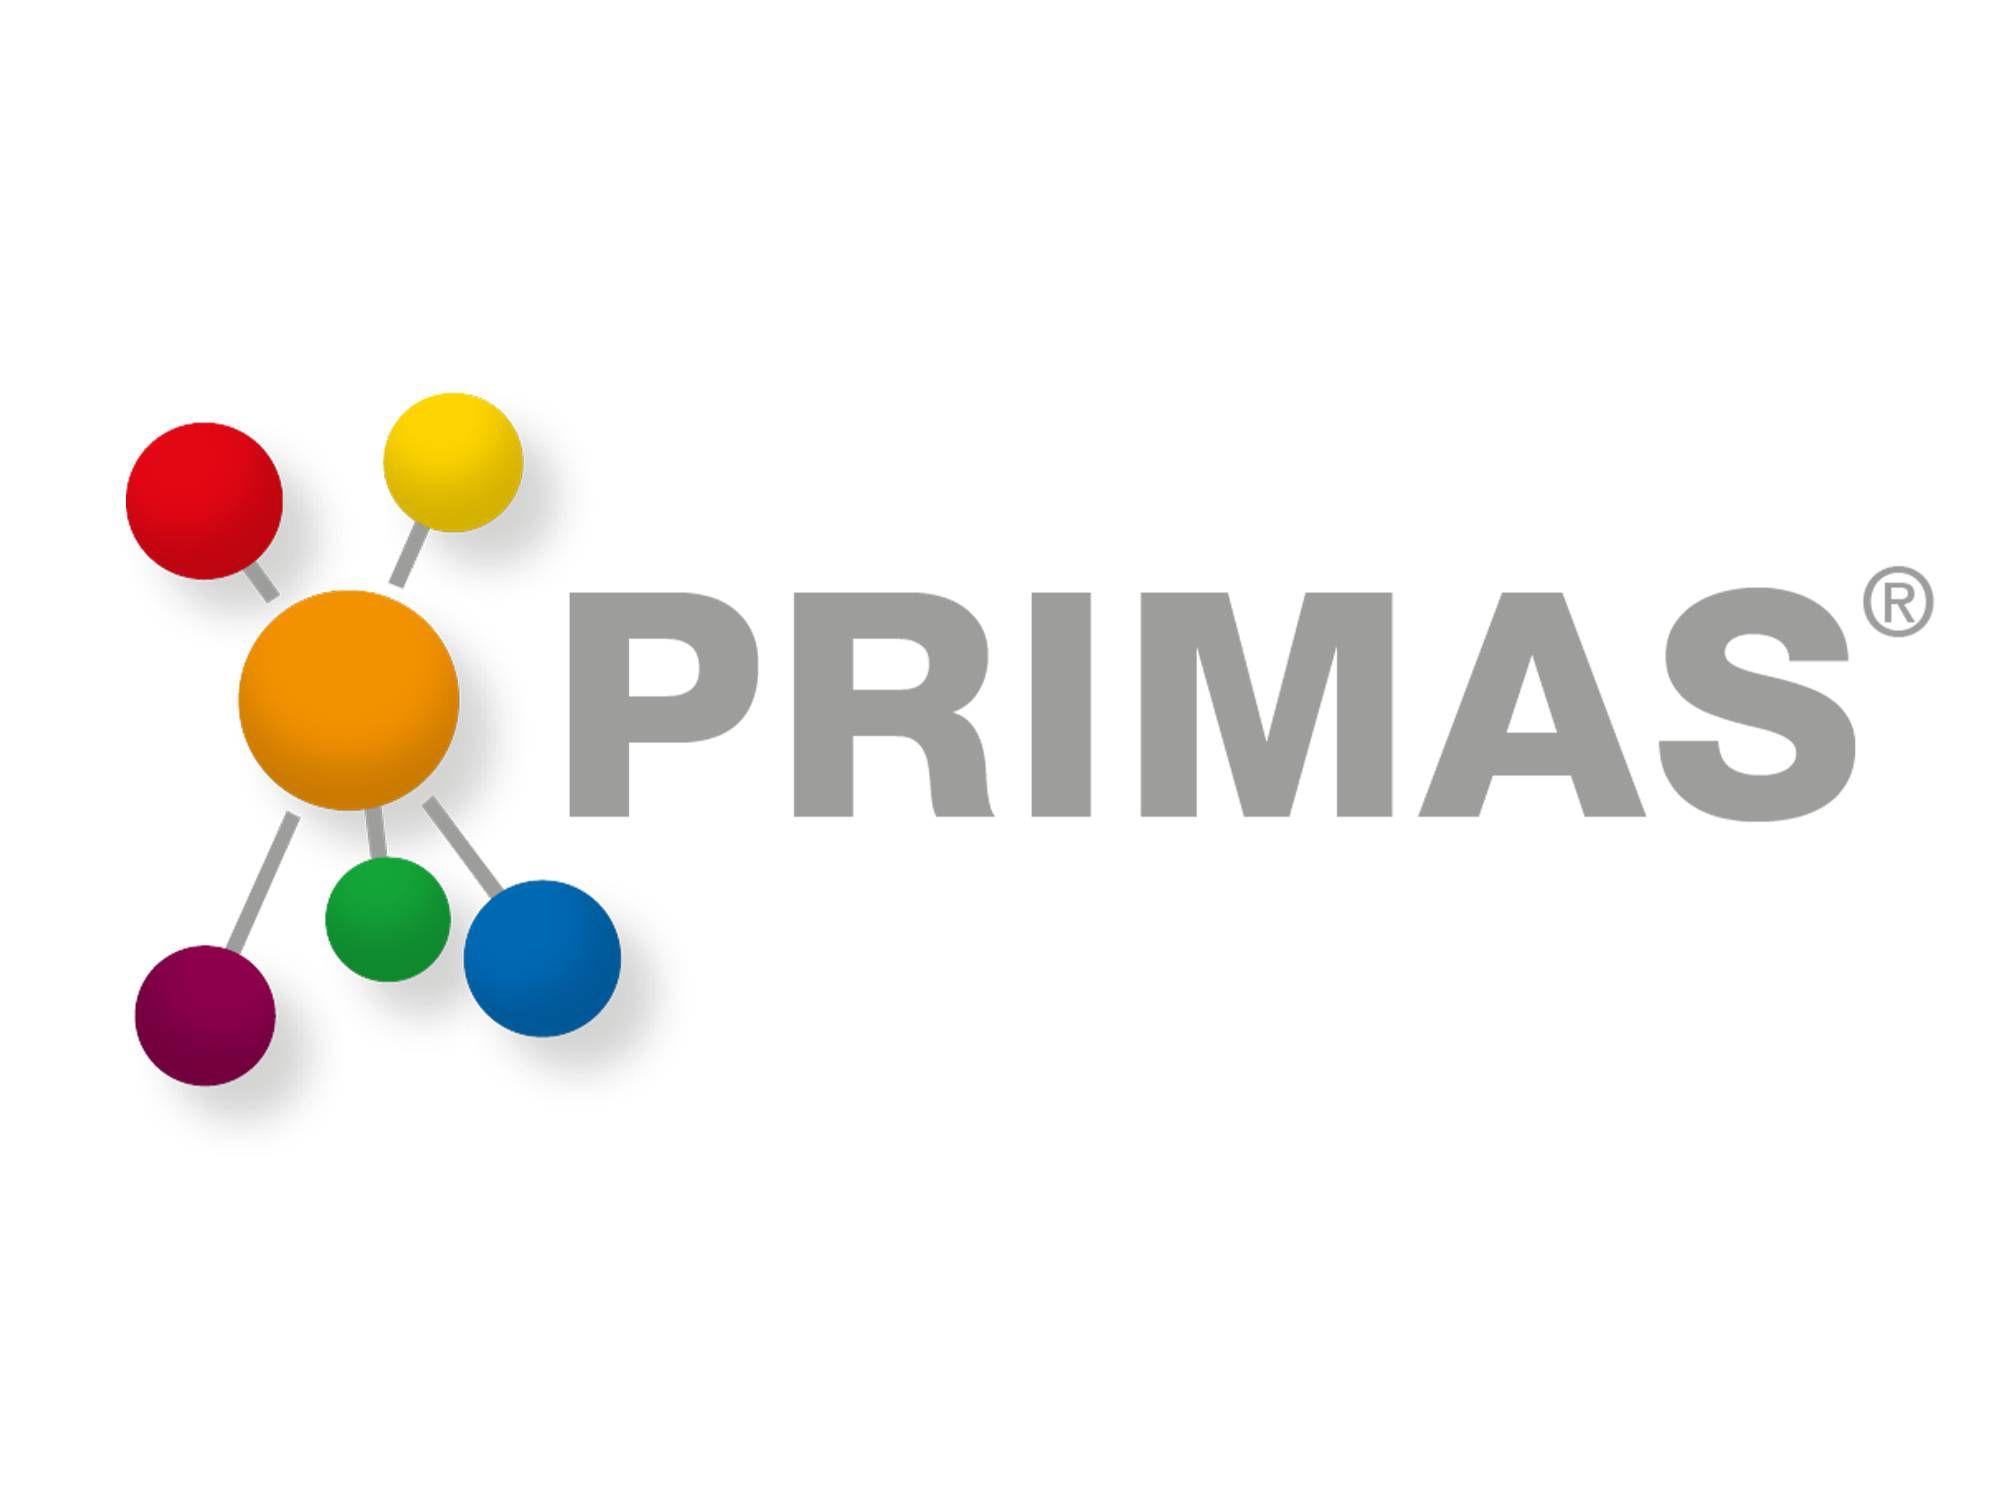 Primas-2021-2000x1500Px.png